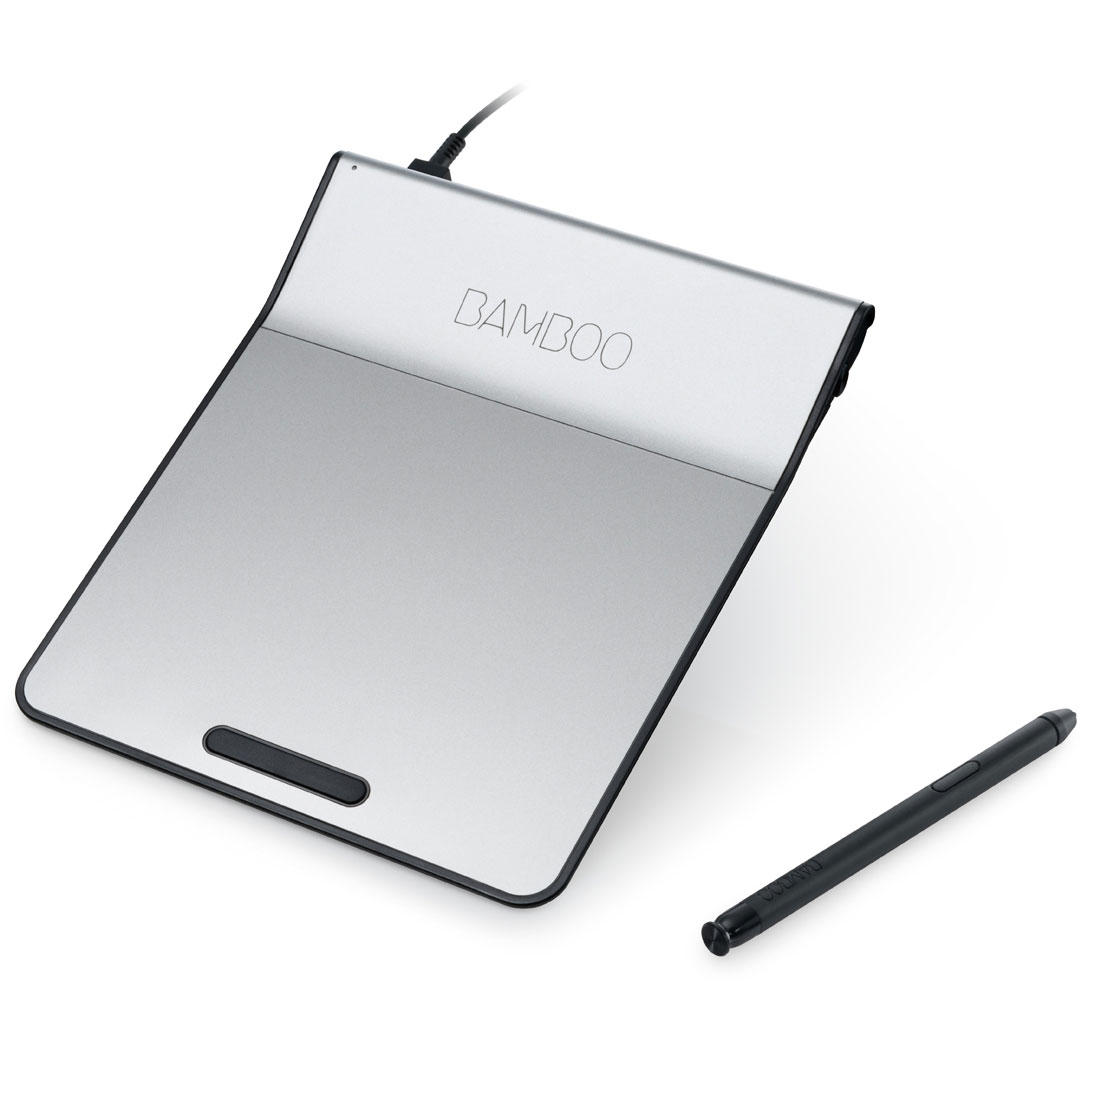 wacom bamboo pad usb tablette graphique wacom sur. Black Bedroom Furniture Sets. Home Design Ideas